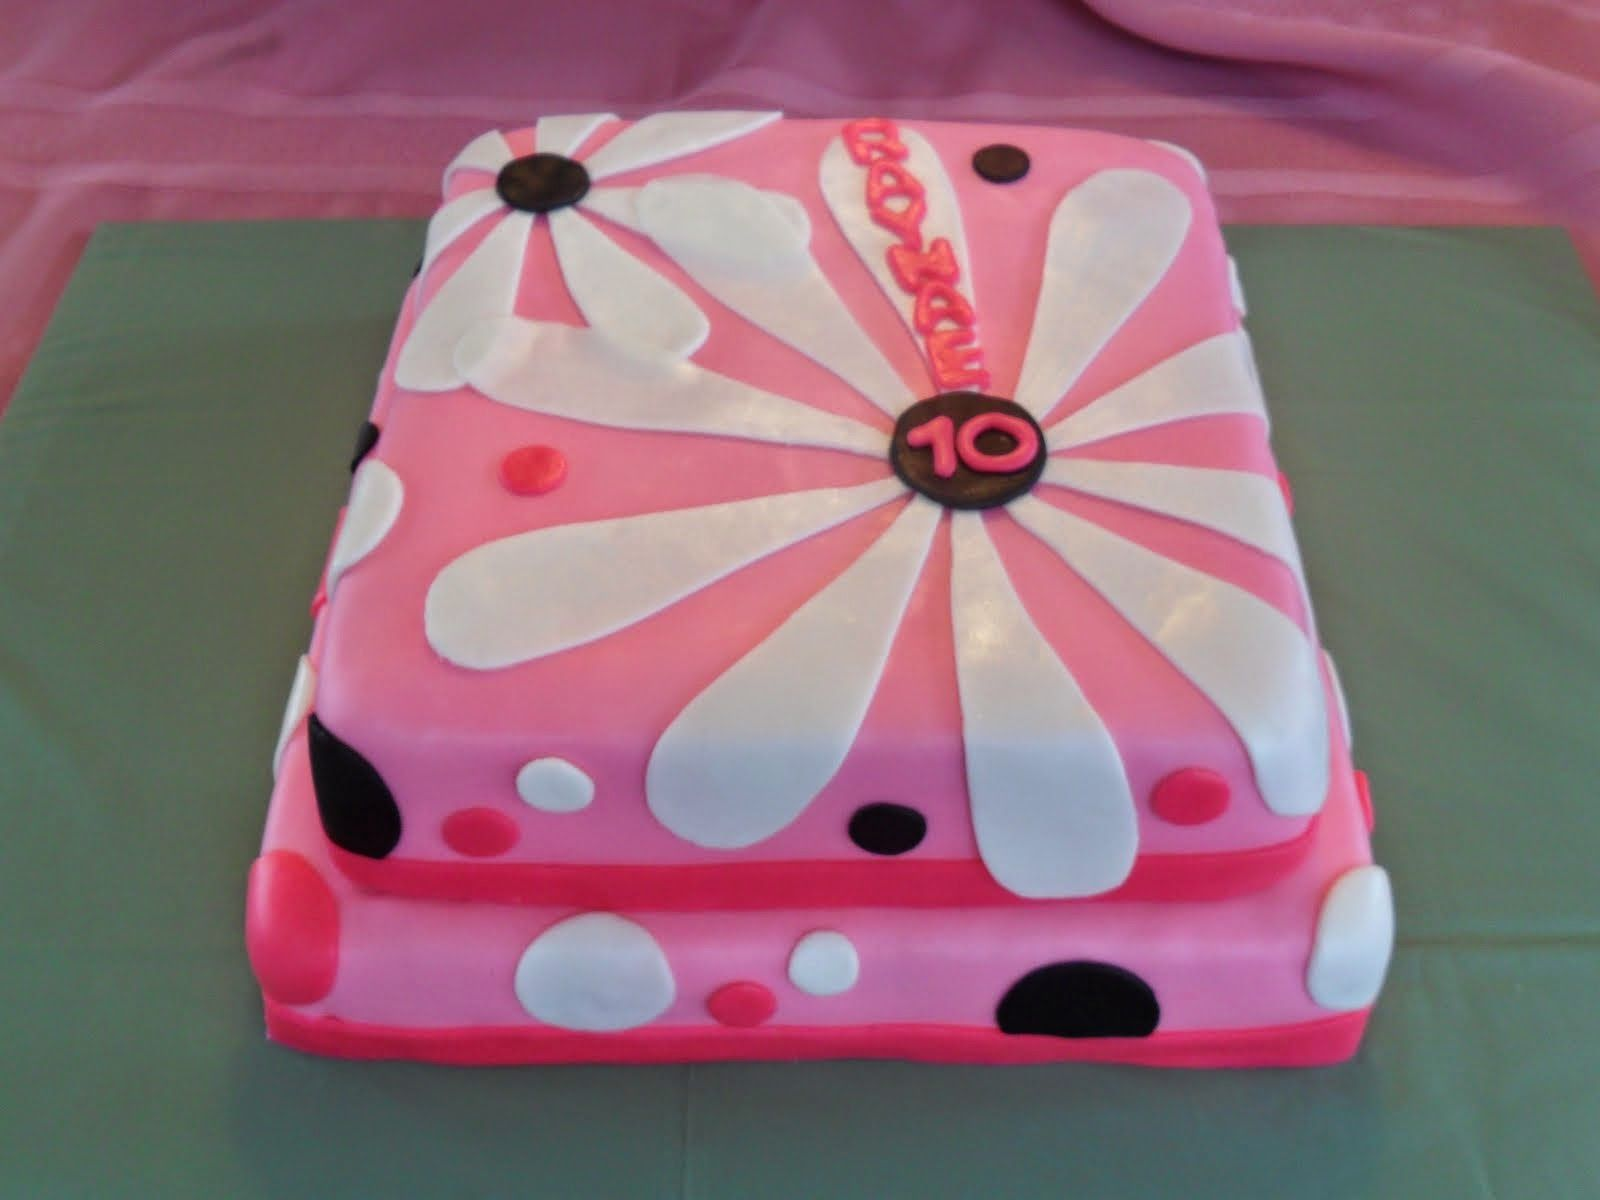 birthdaycakepicturesforgirls9jpg 16001200 Bolos para